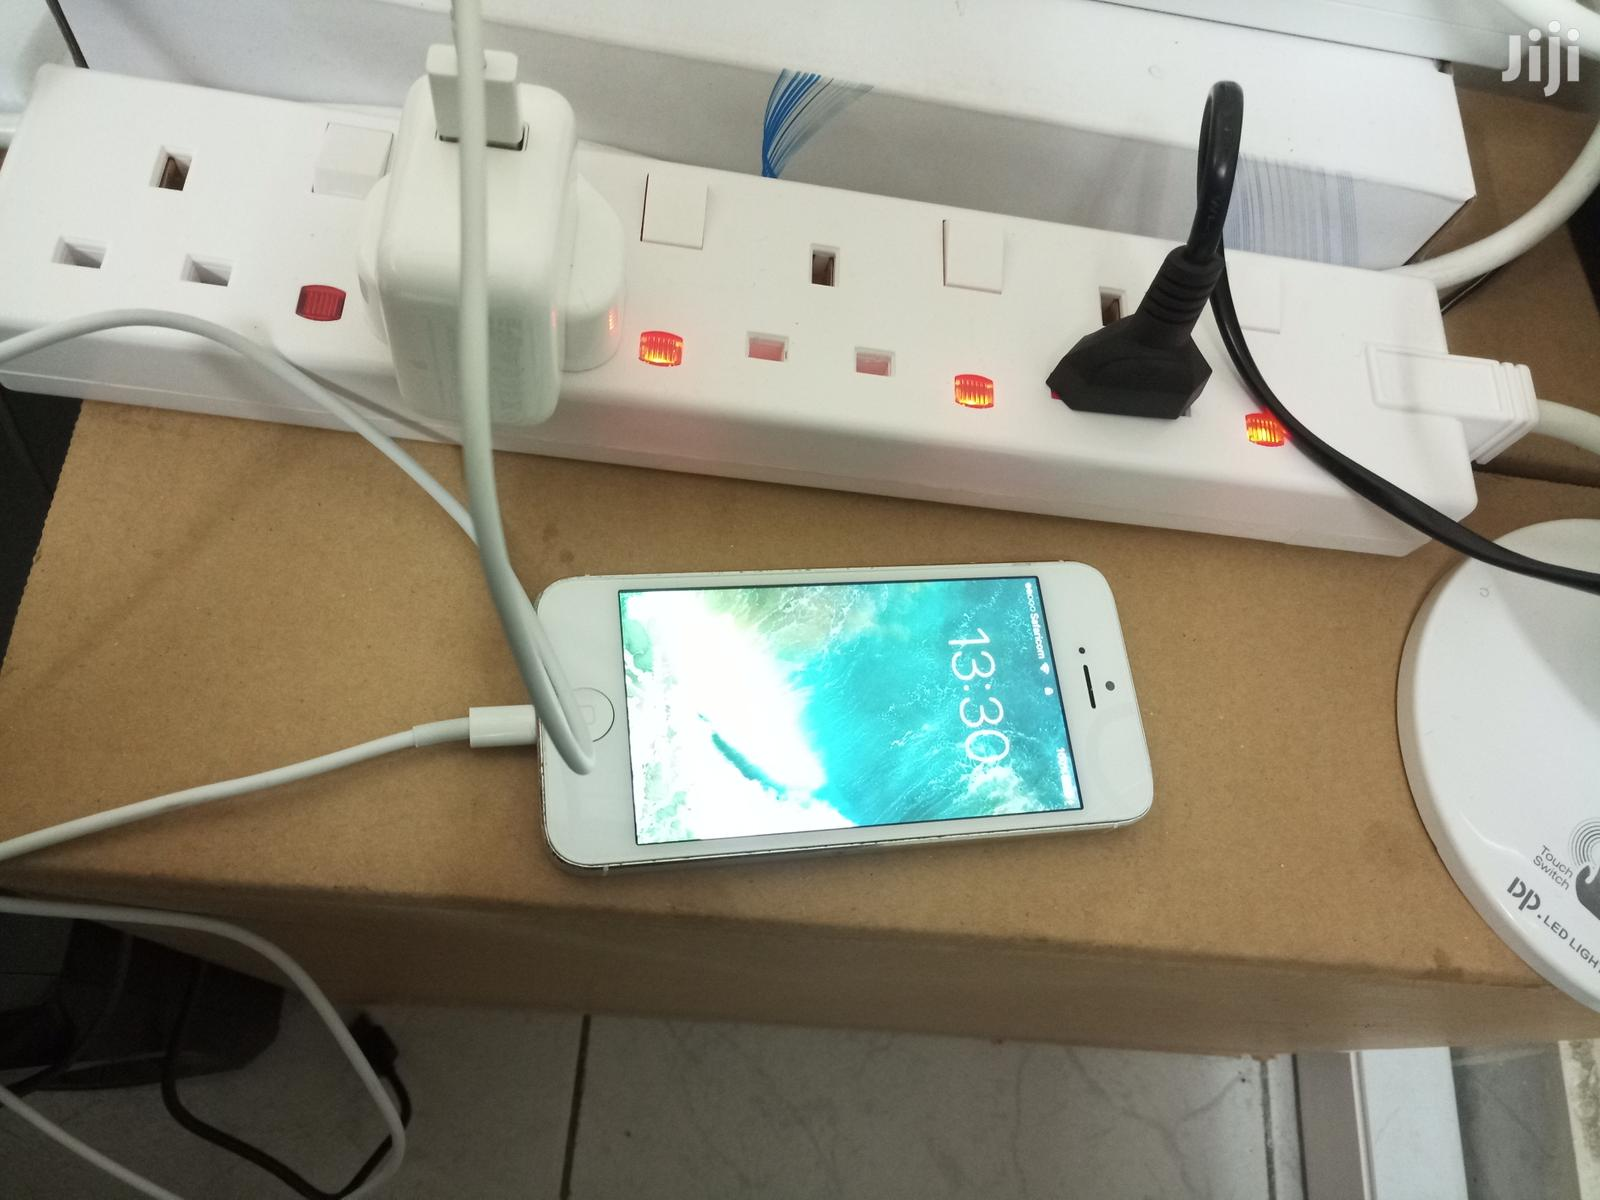 Apple iPhone 5s 16 GB White | Mobile Phones for sale in Central Kisumu, Kisumu, Kenya